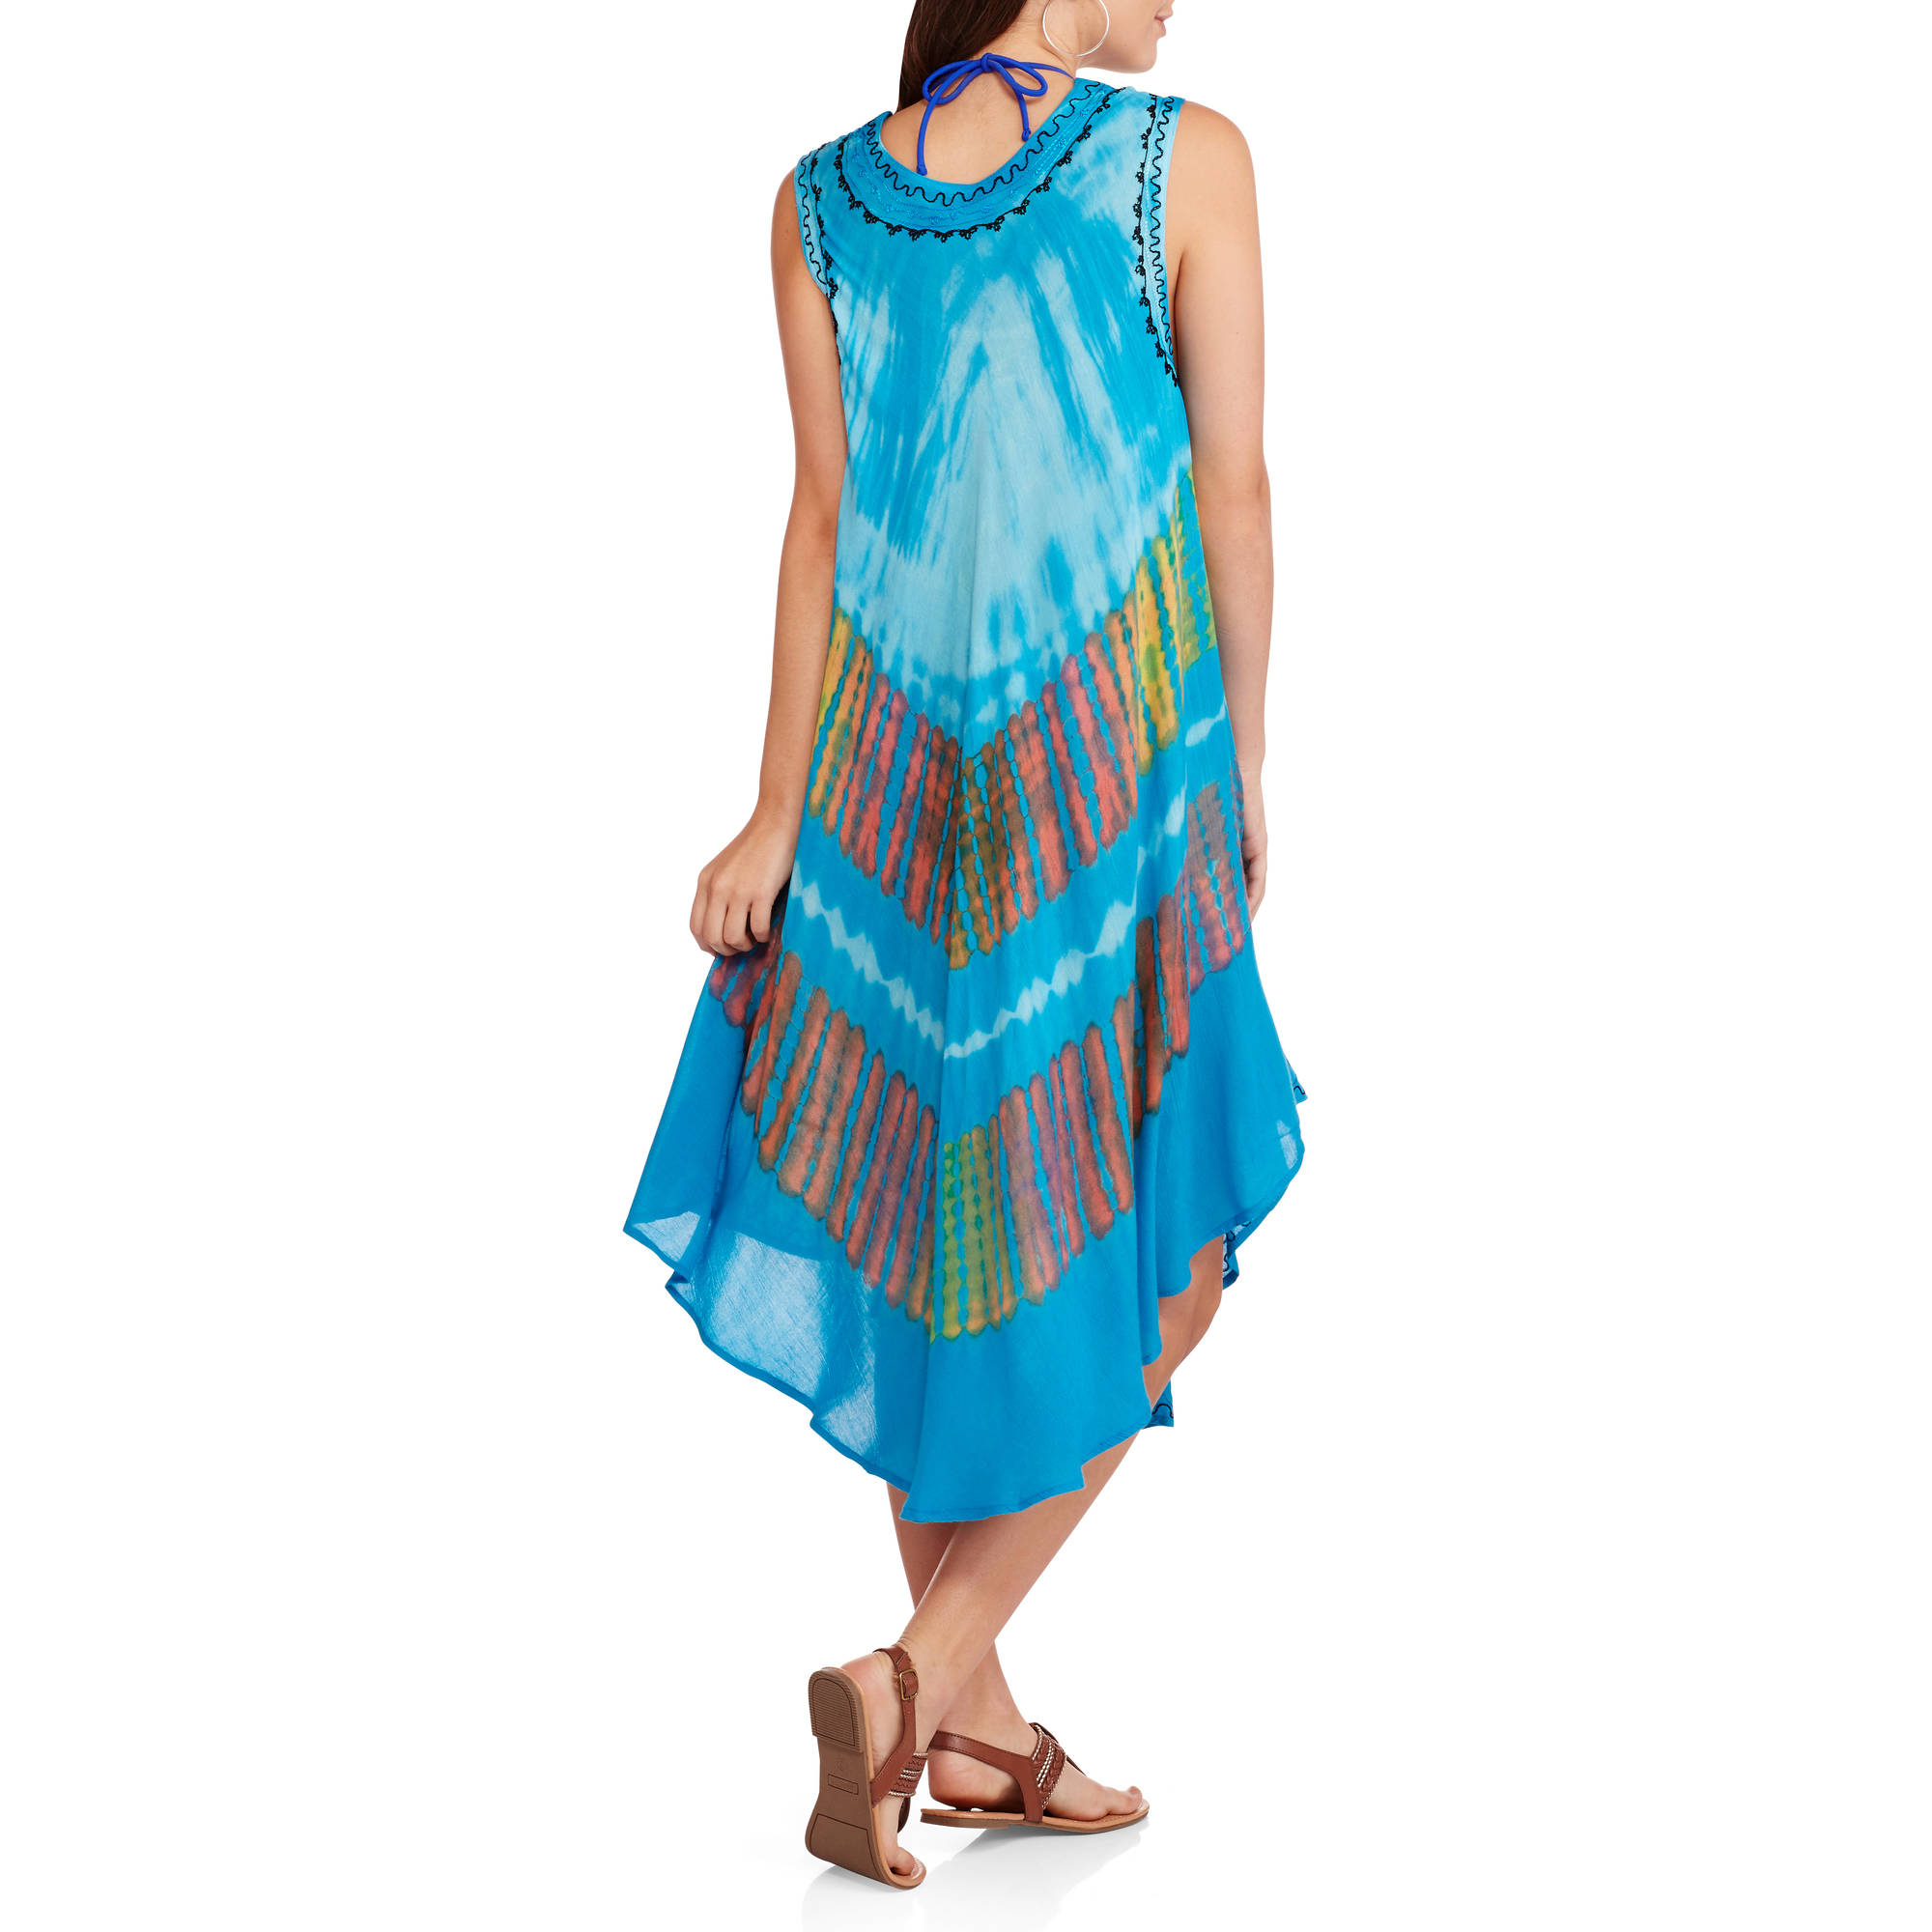 861c823e4b IN GEAR - Women's Swim Tie Dye Umbrella Cover-Up Dress - Walmart.com